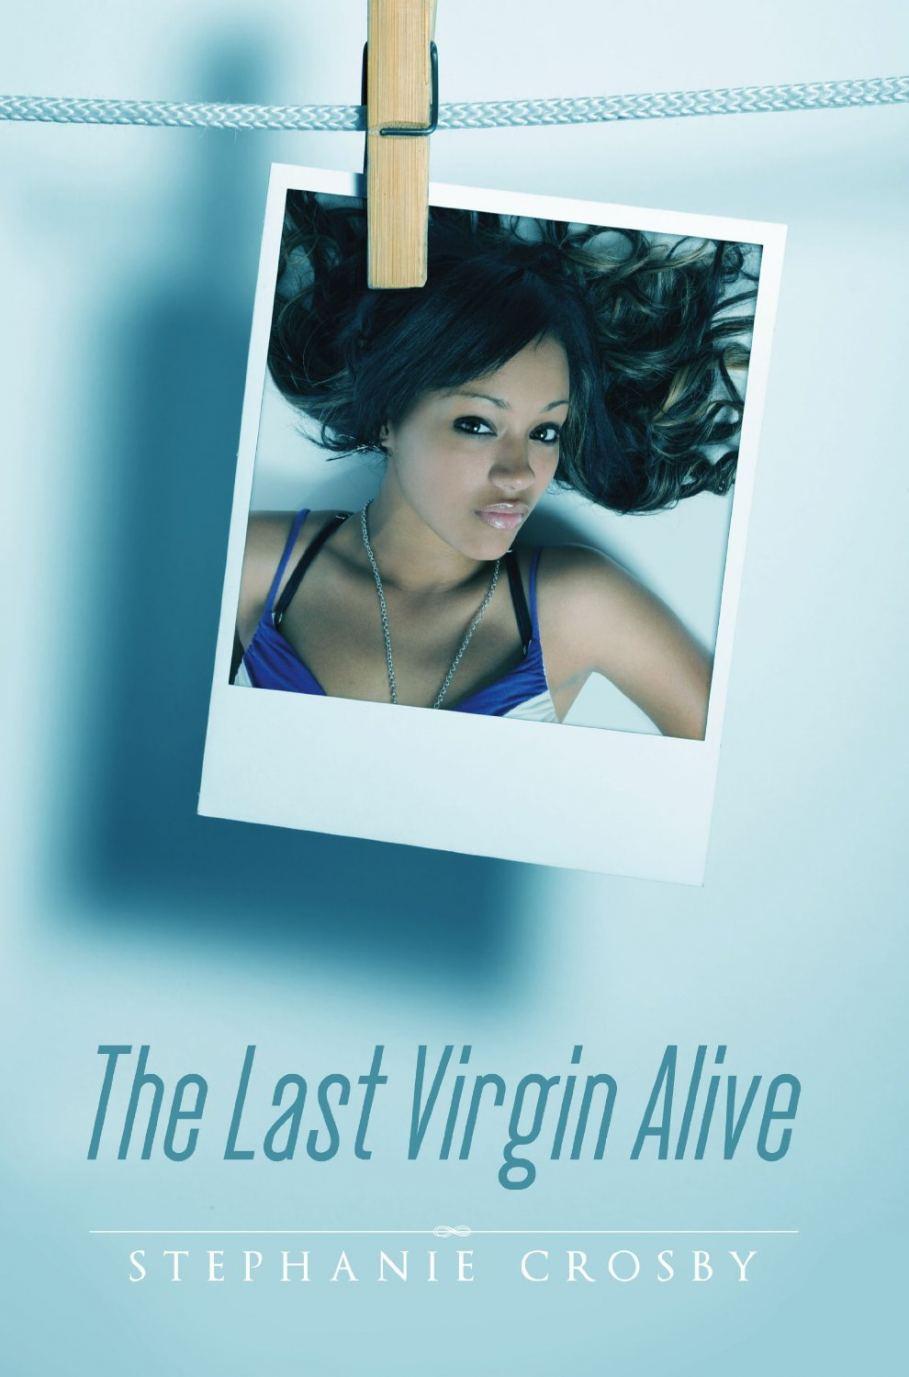 The Last Virgin Alive